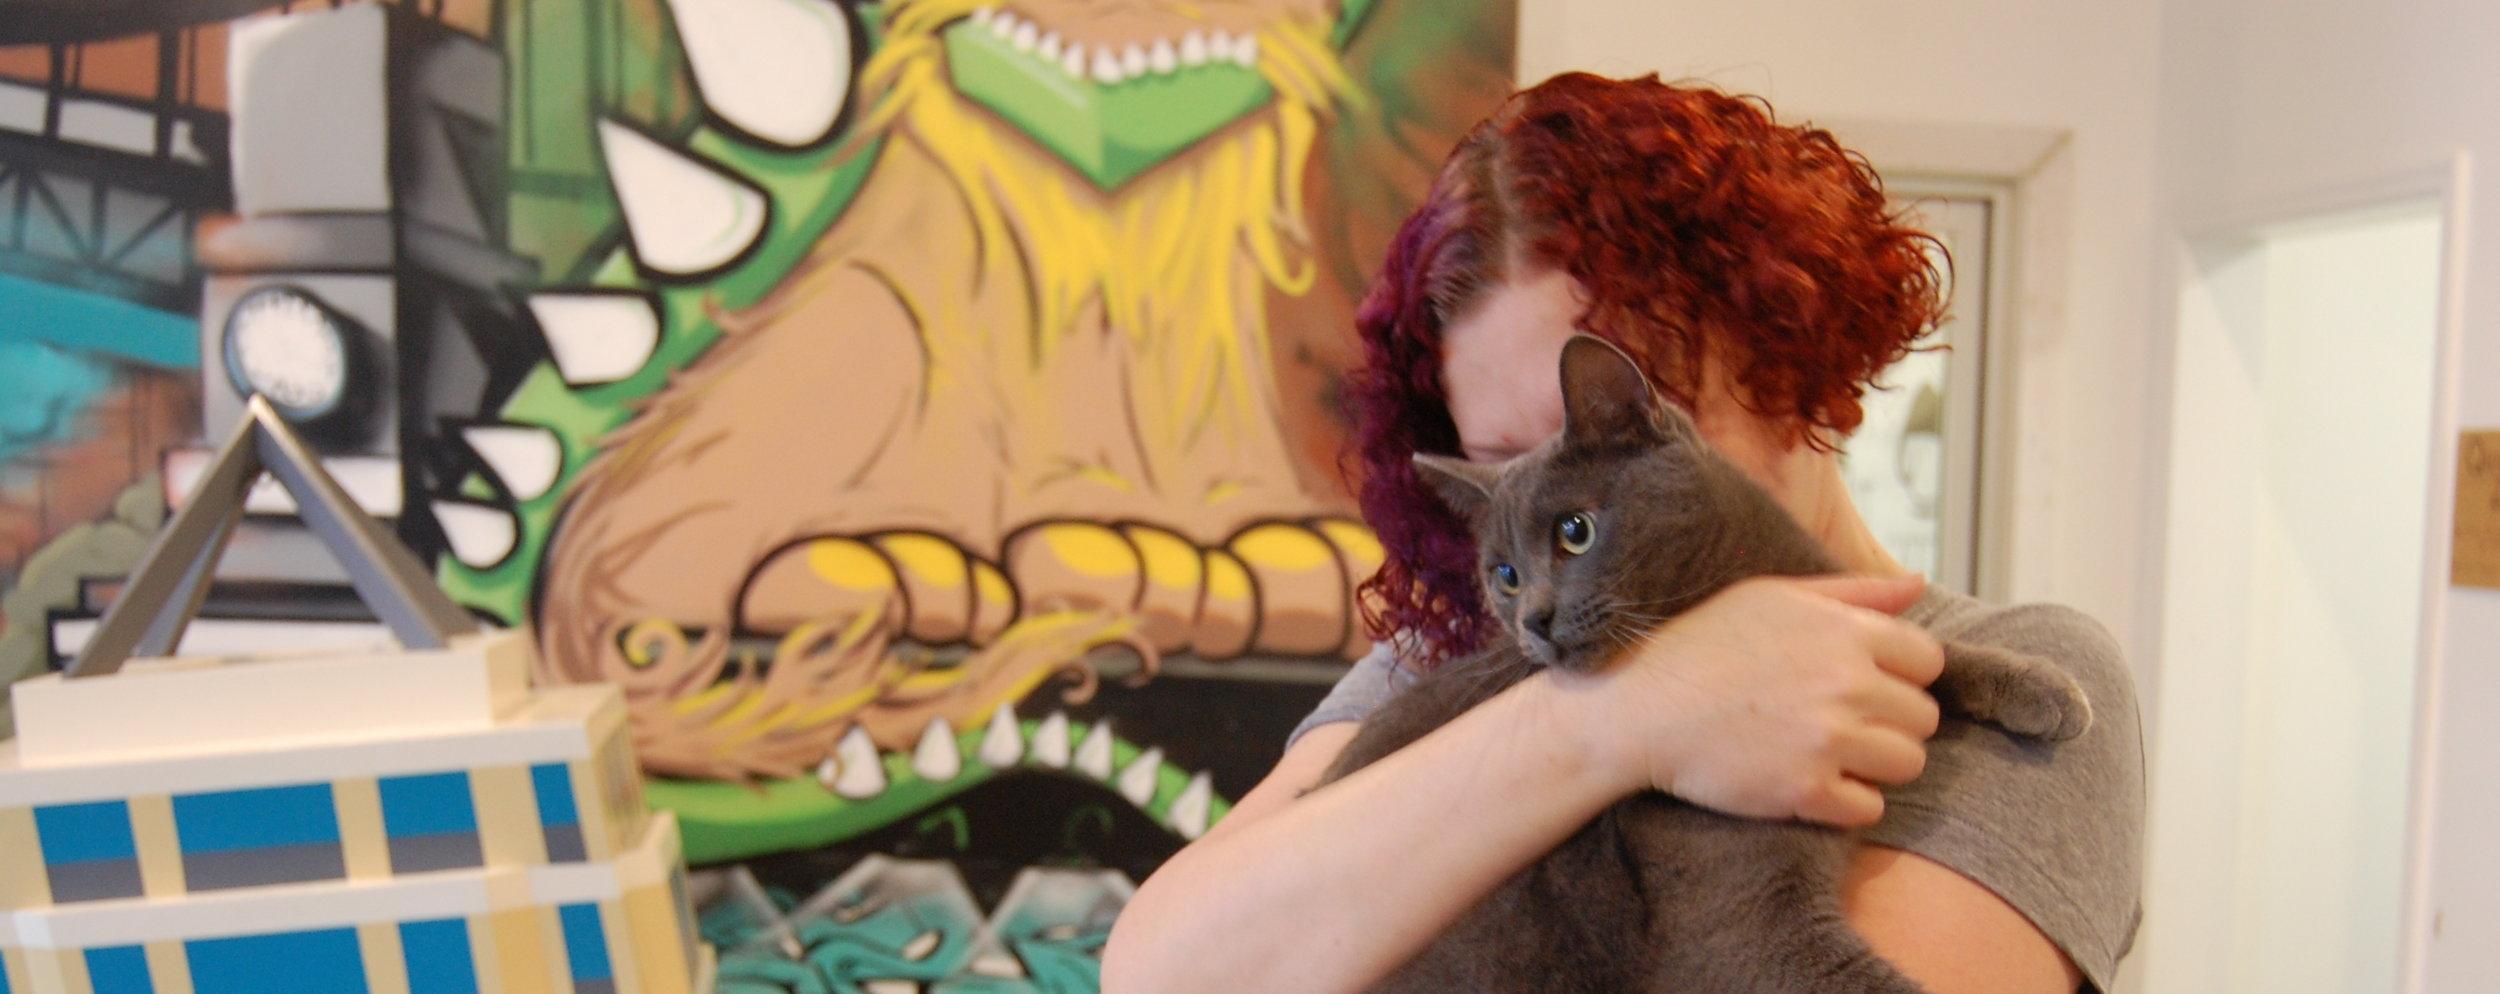 Erin hugs Elise goodbye before sending her off to her adoptive home.